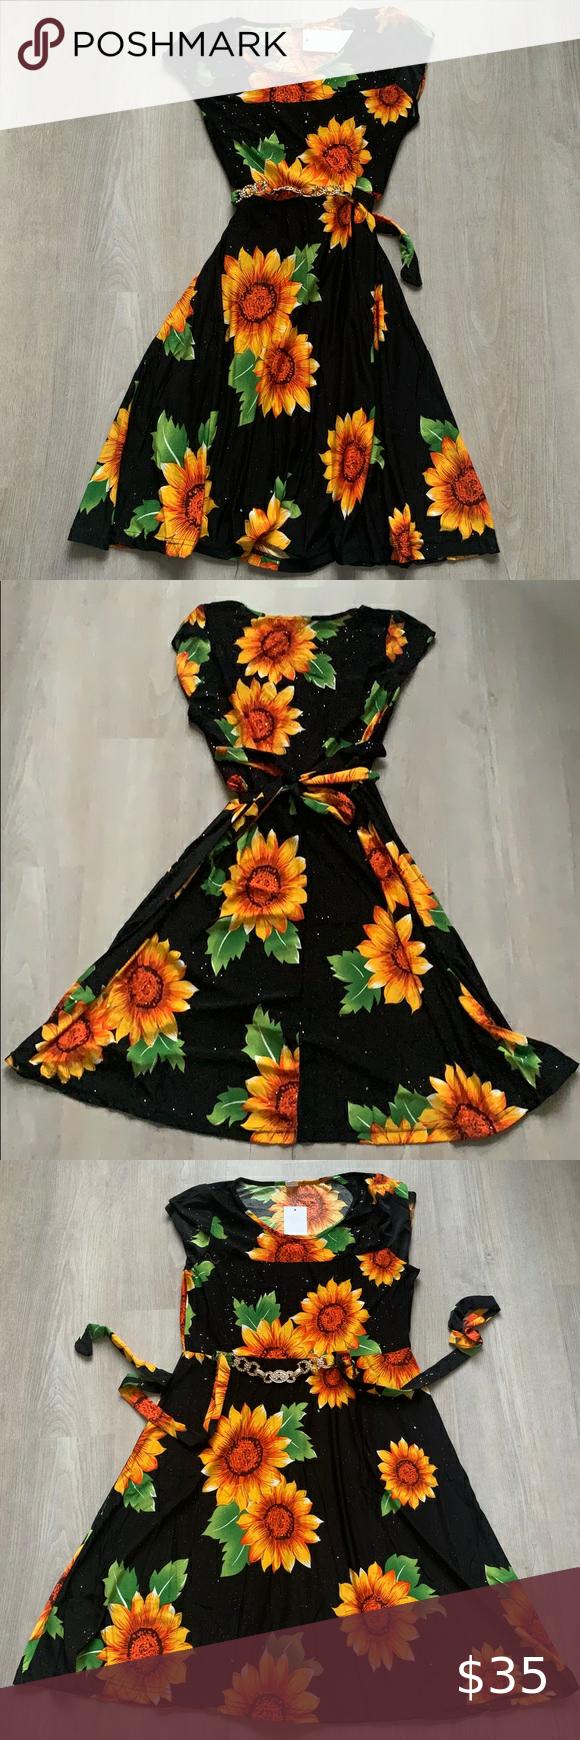 Sunflower Midi Dress Midi Dress Boutique Sunflower Dress Clothes Design [ 1740 x 580 Pixel ]